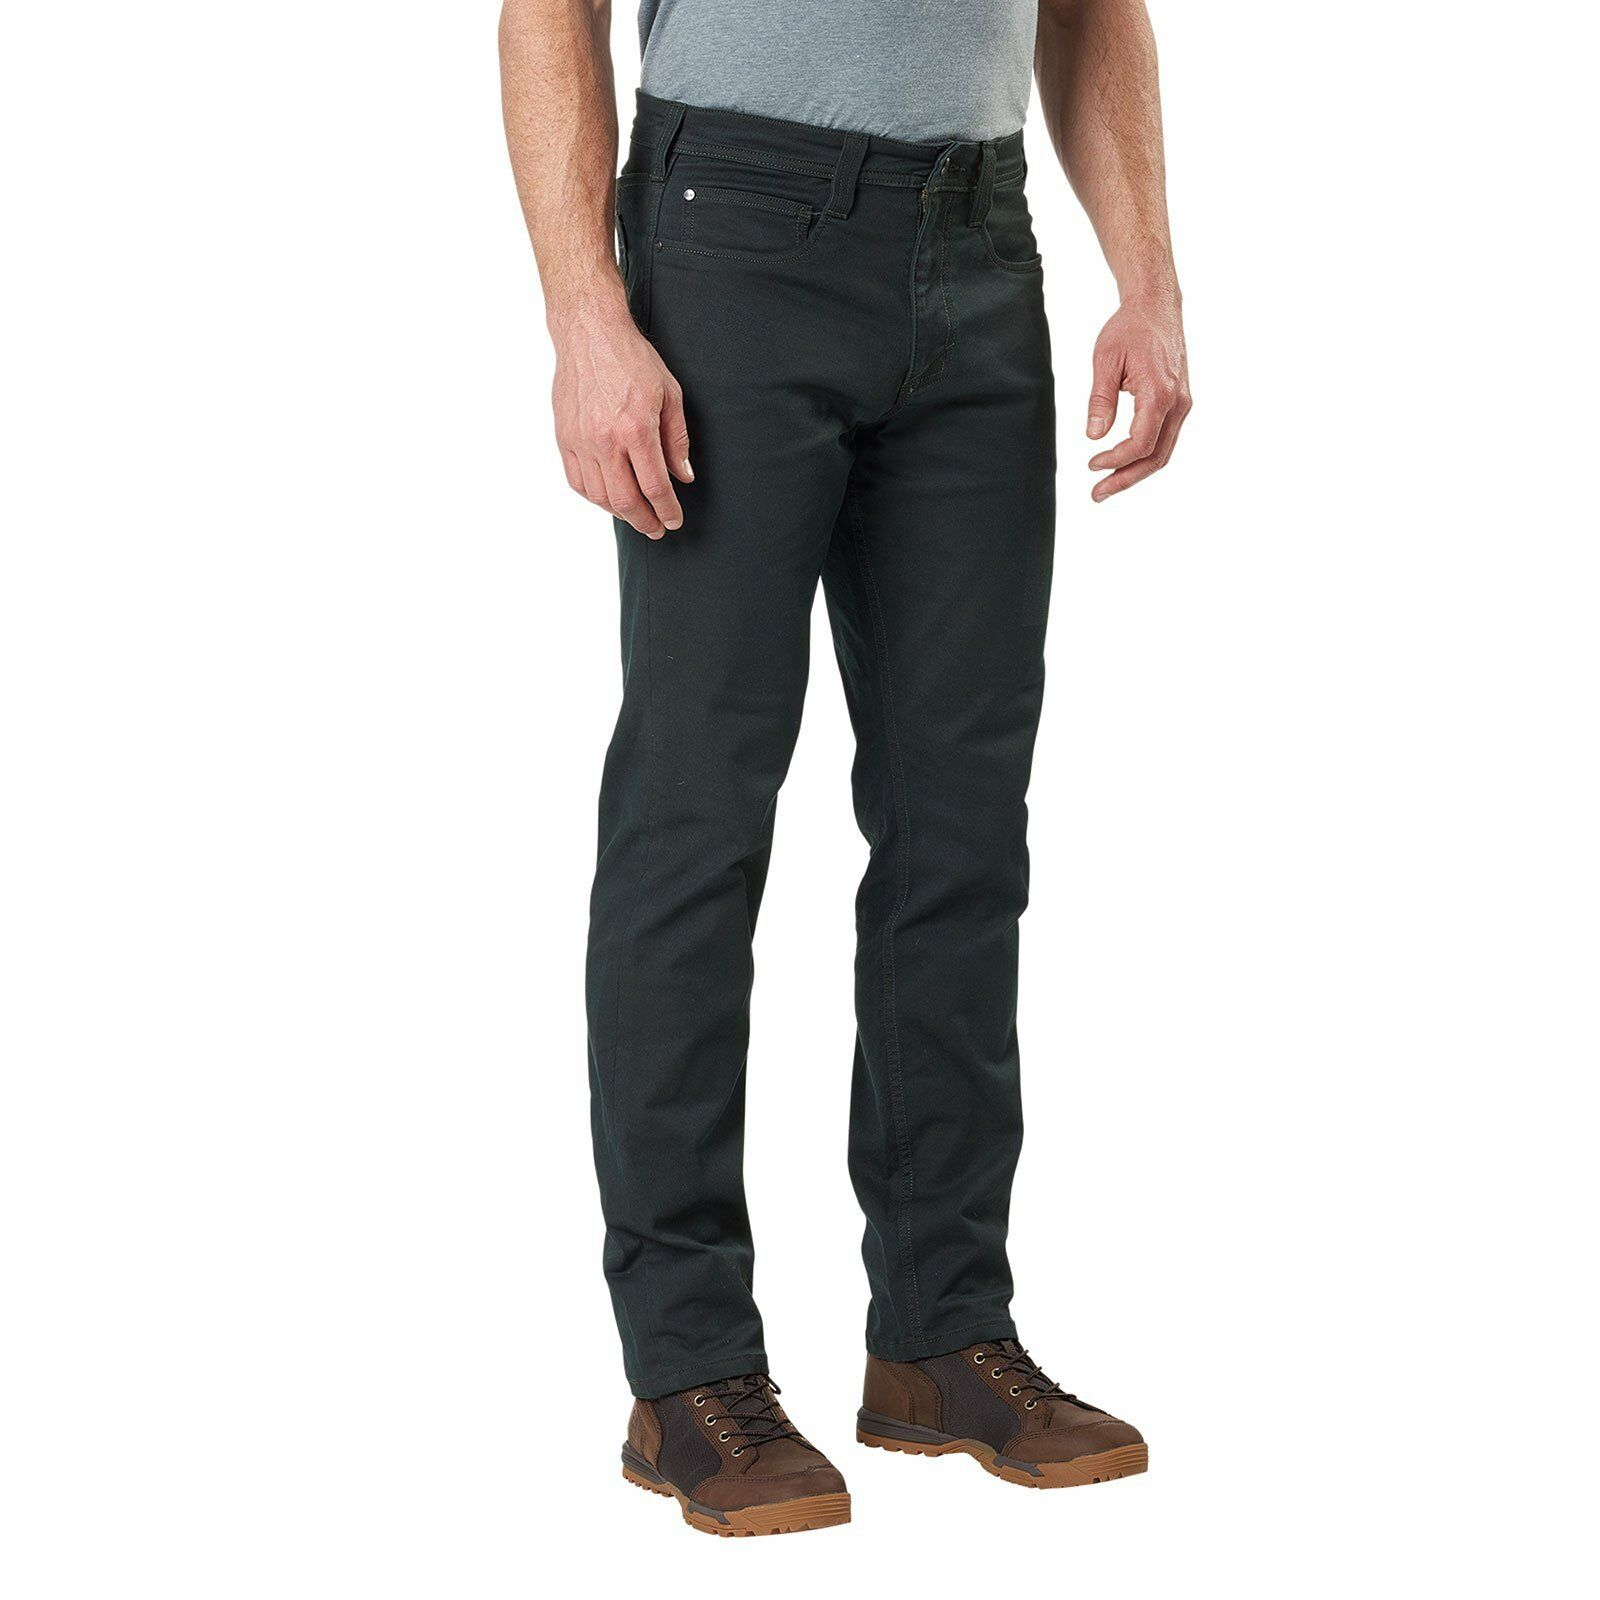 5.11 Tactical Defender Flex Pant Slim Unisex Pants - Oil Green All Sizes